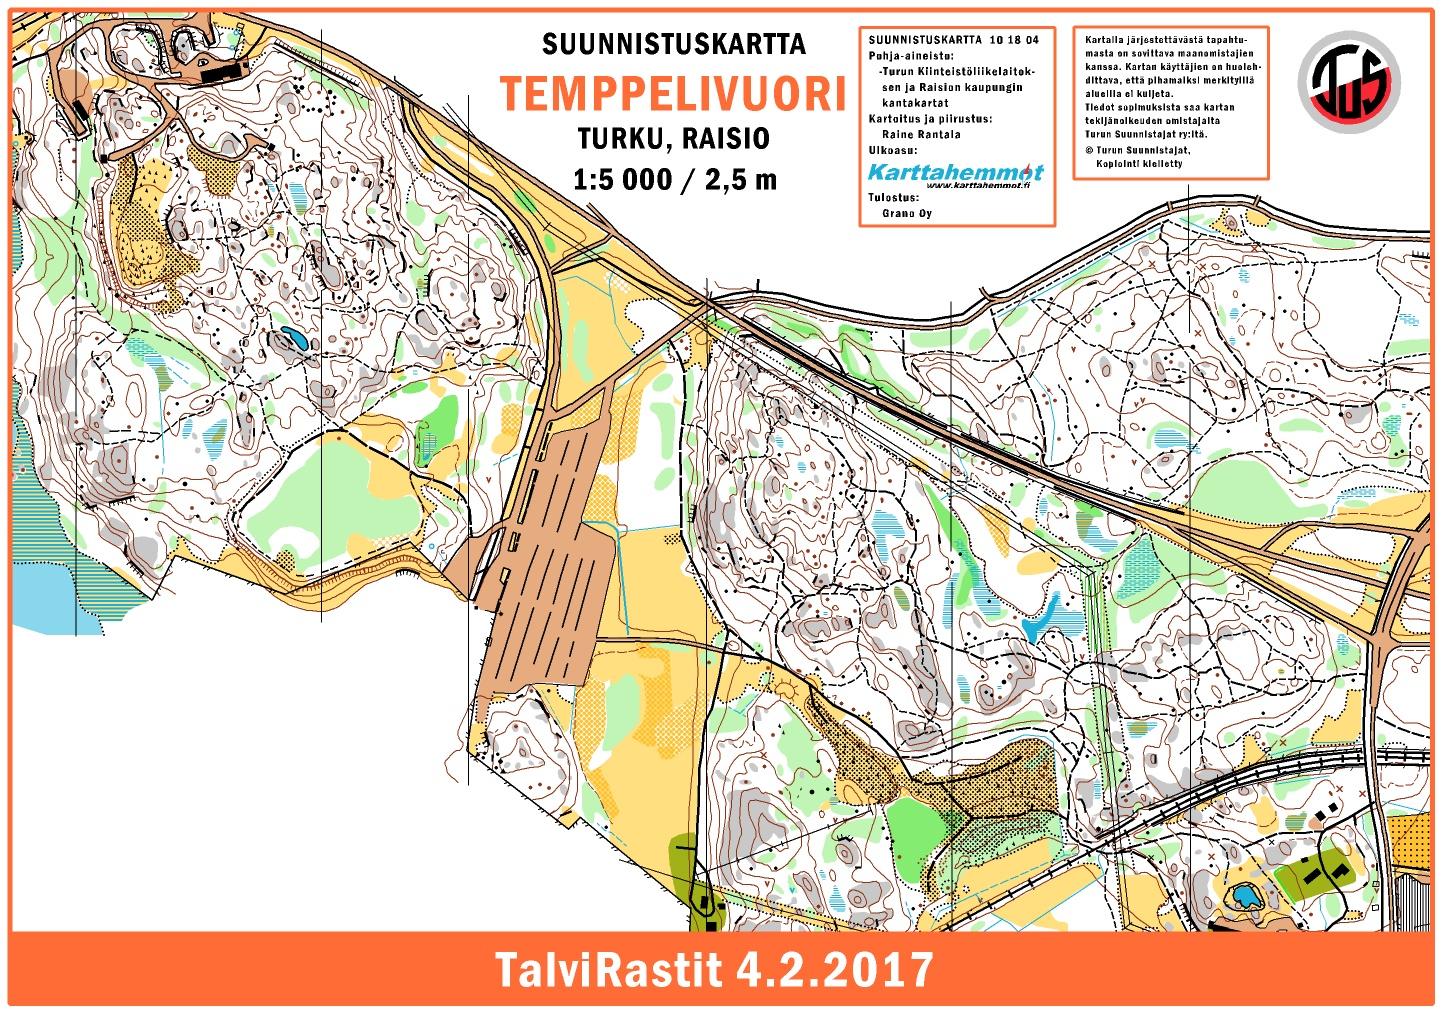 TalviRastit 422017 February 4th 2017 Orienteering Map from